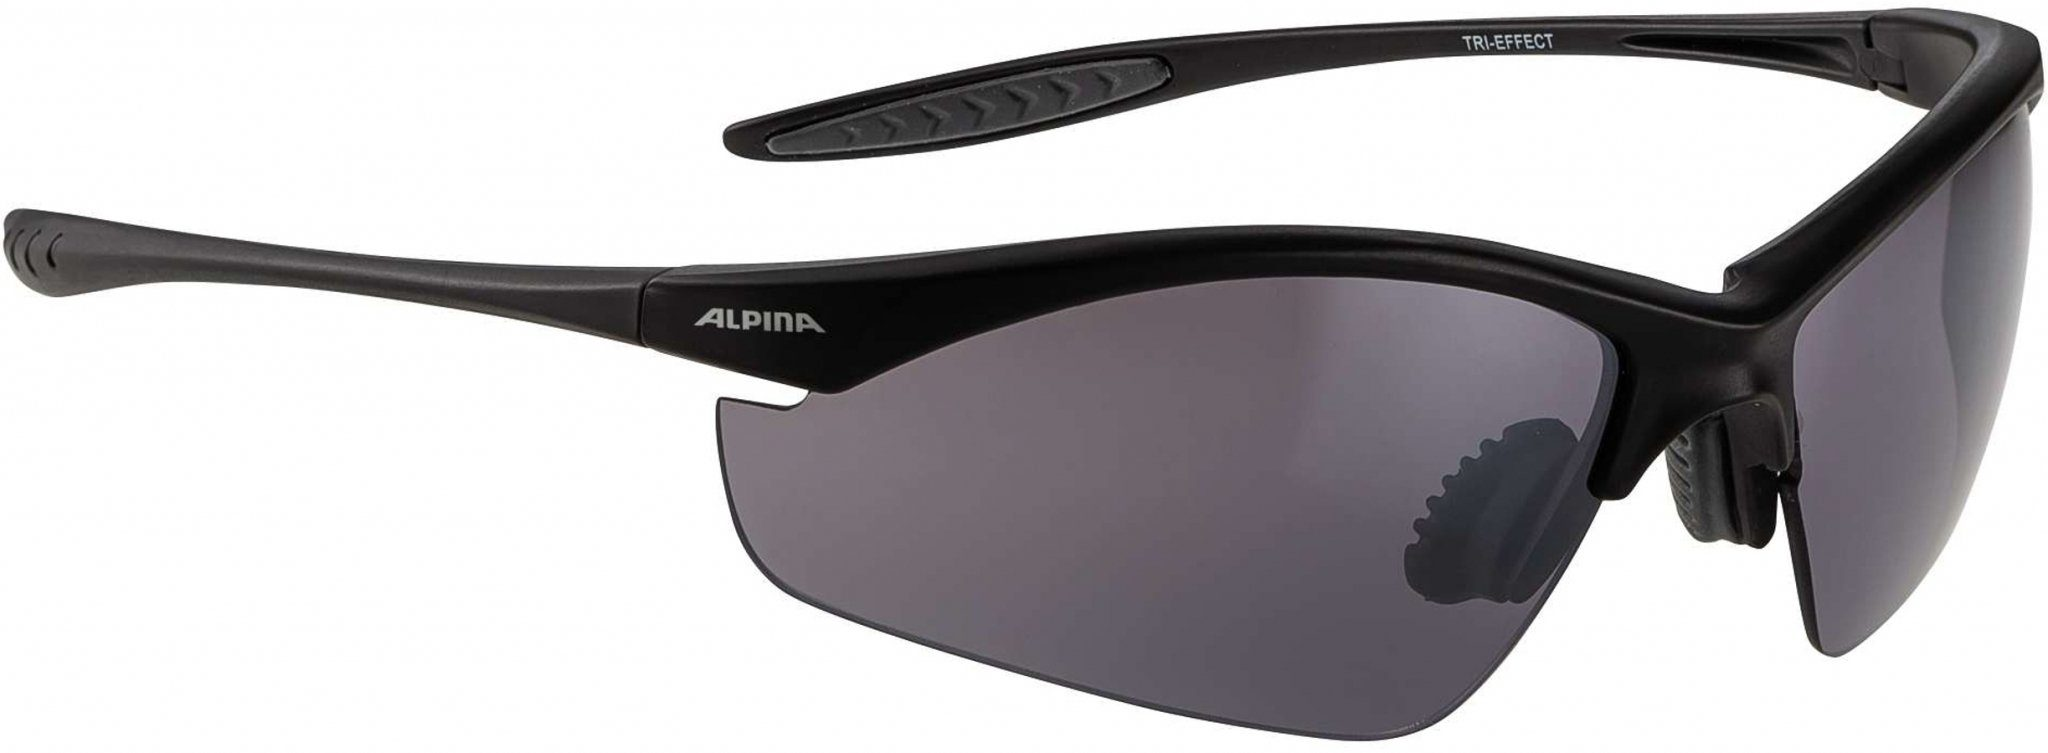 Alpina Radsportbrille »Alpina Tri-Effect«